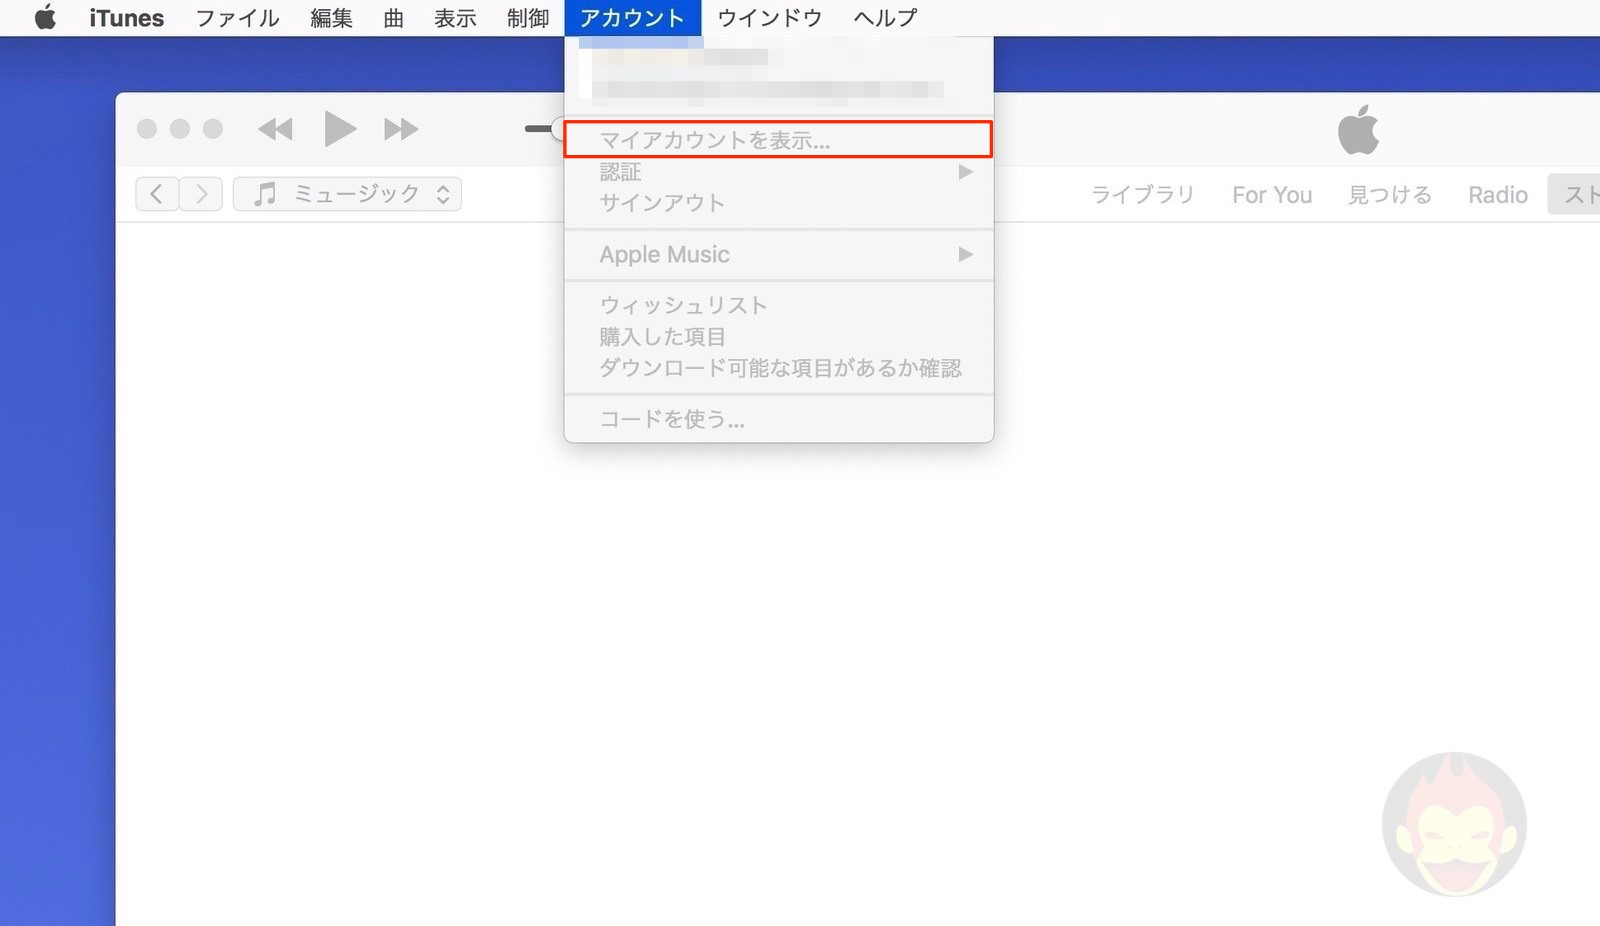 Charging-apple-id-on-mac-05-2-2.jpg